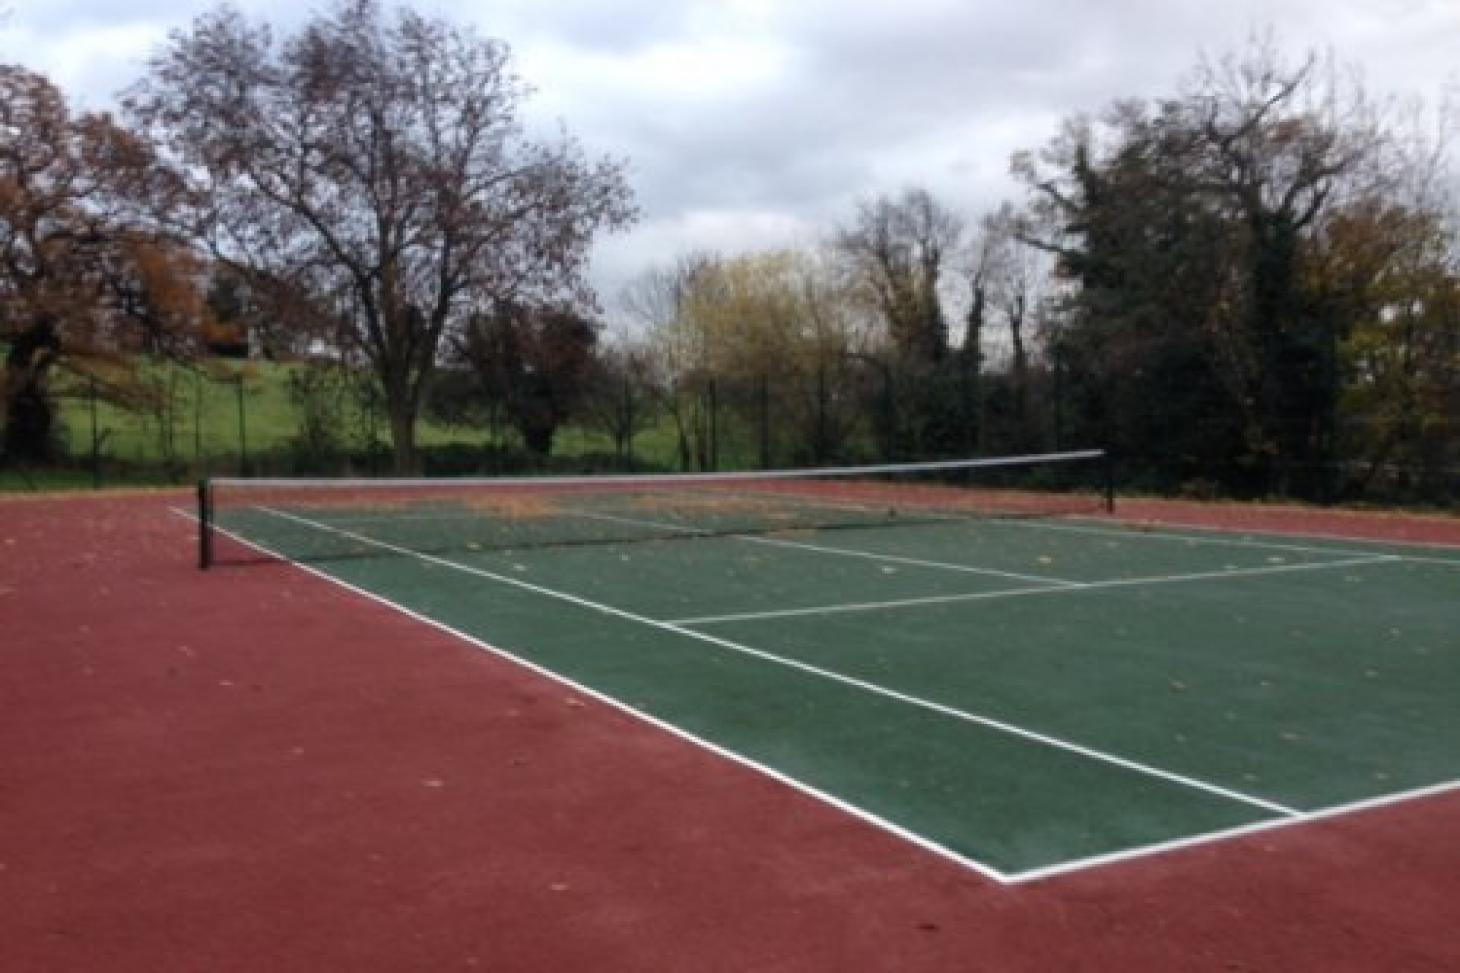 The Rookery Outdoor | Hard (macadam) tennis court